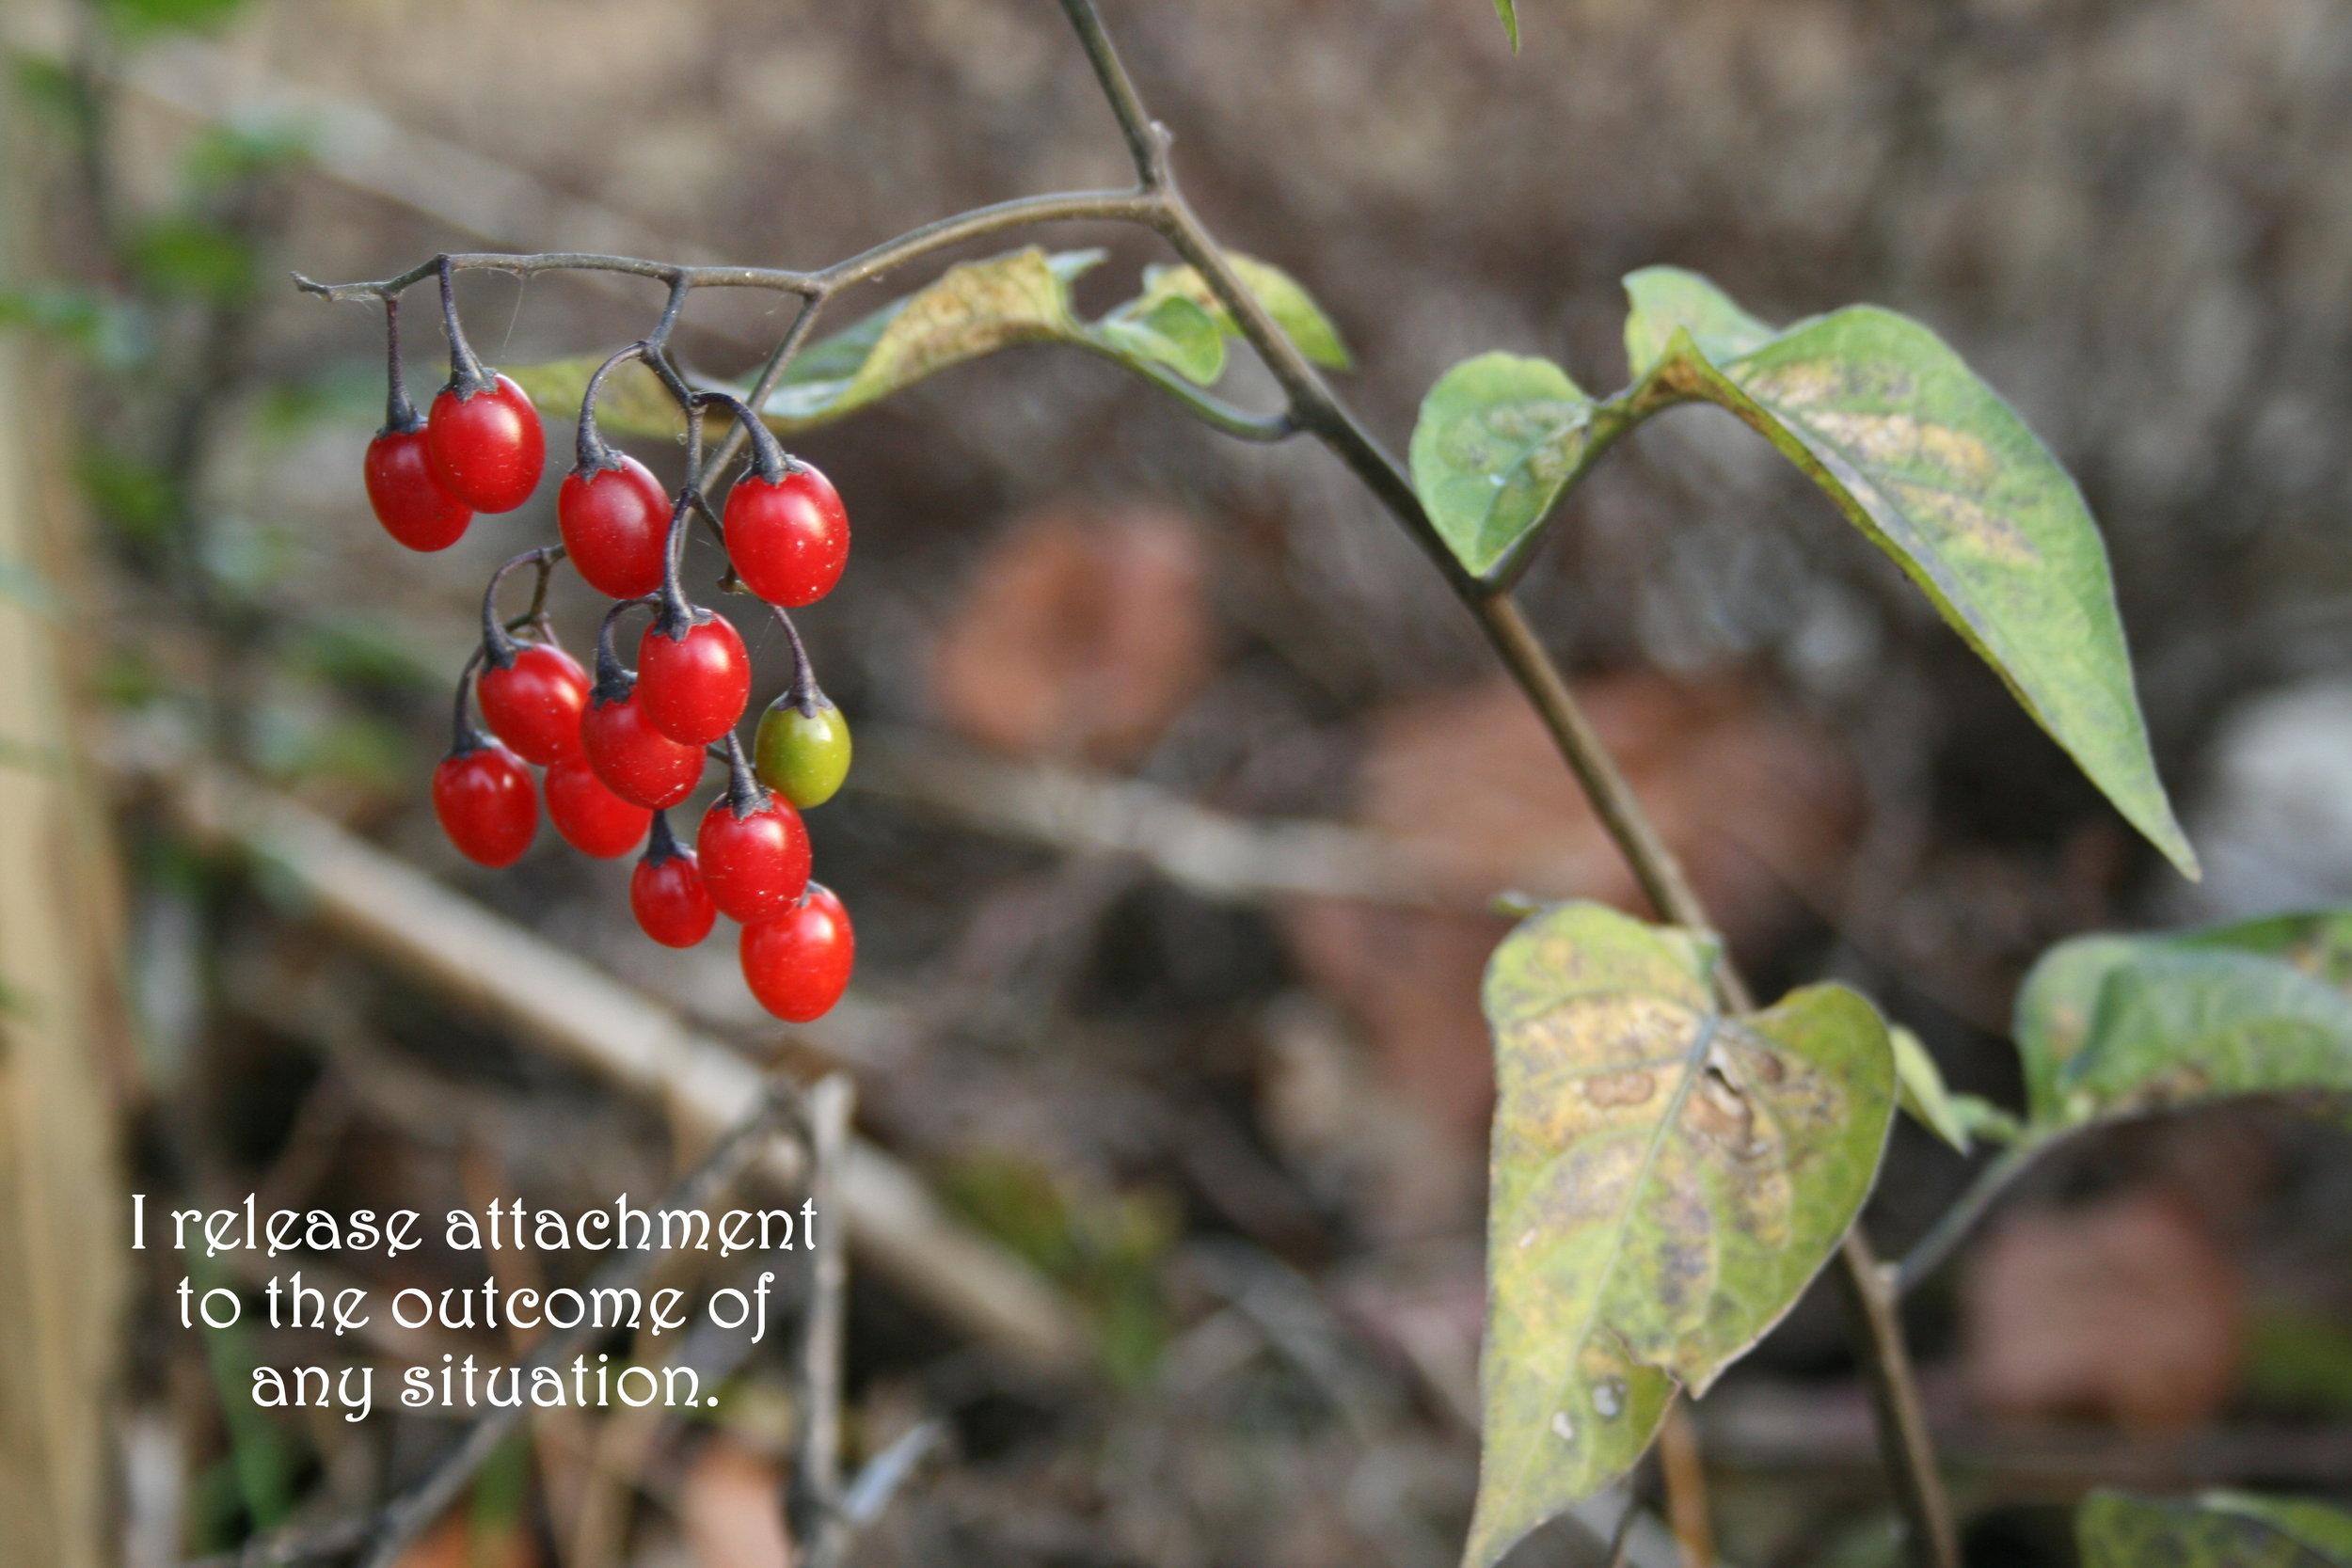 Berries_release attachment.jpg